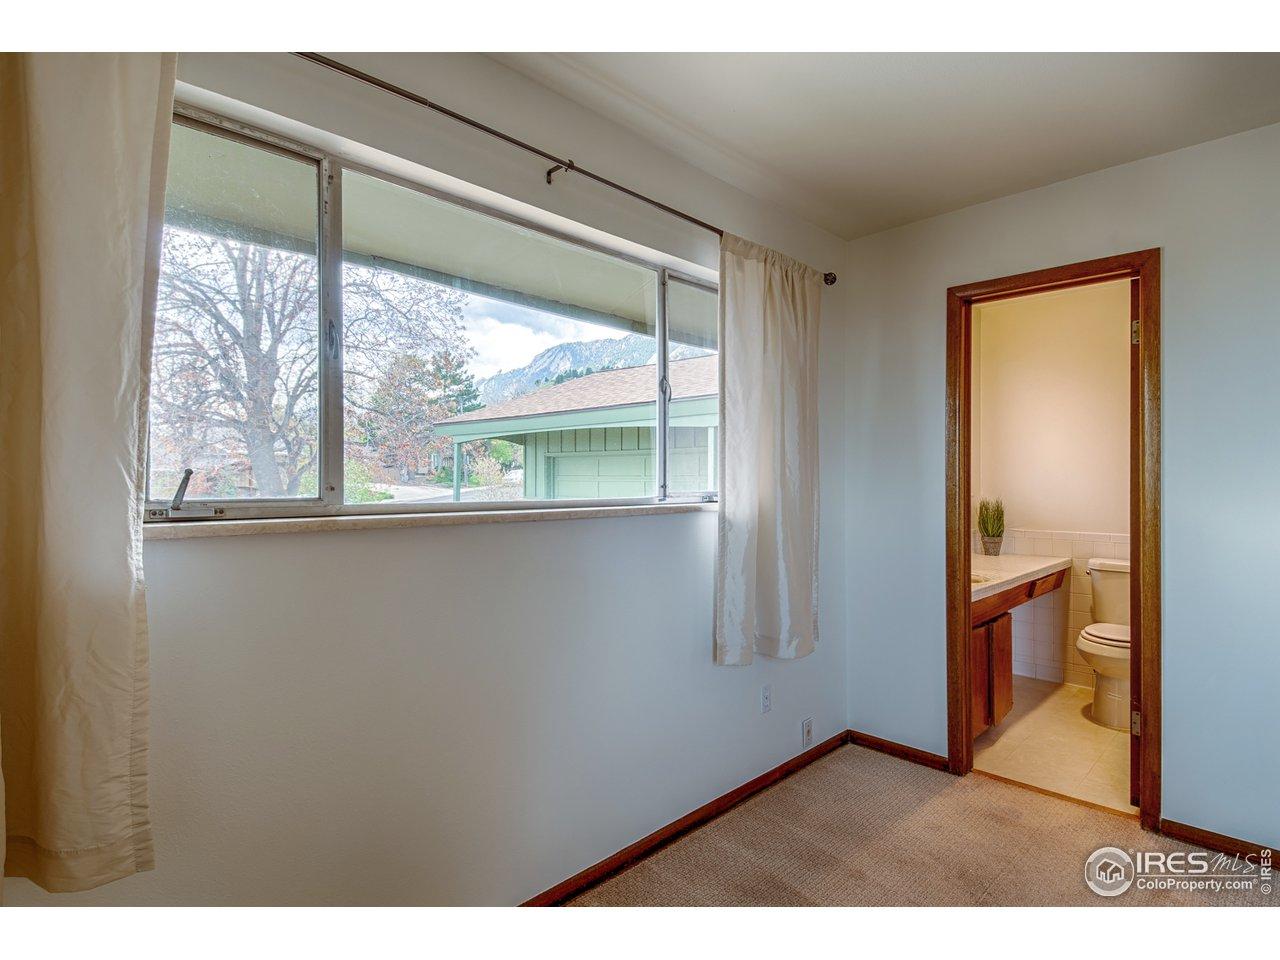 Master bedroom w/ south views & 3/4 bath